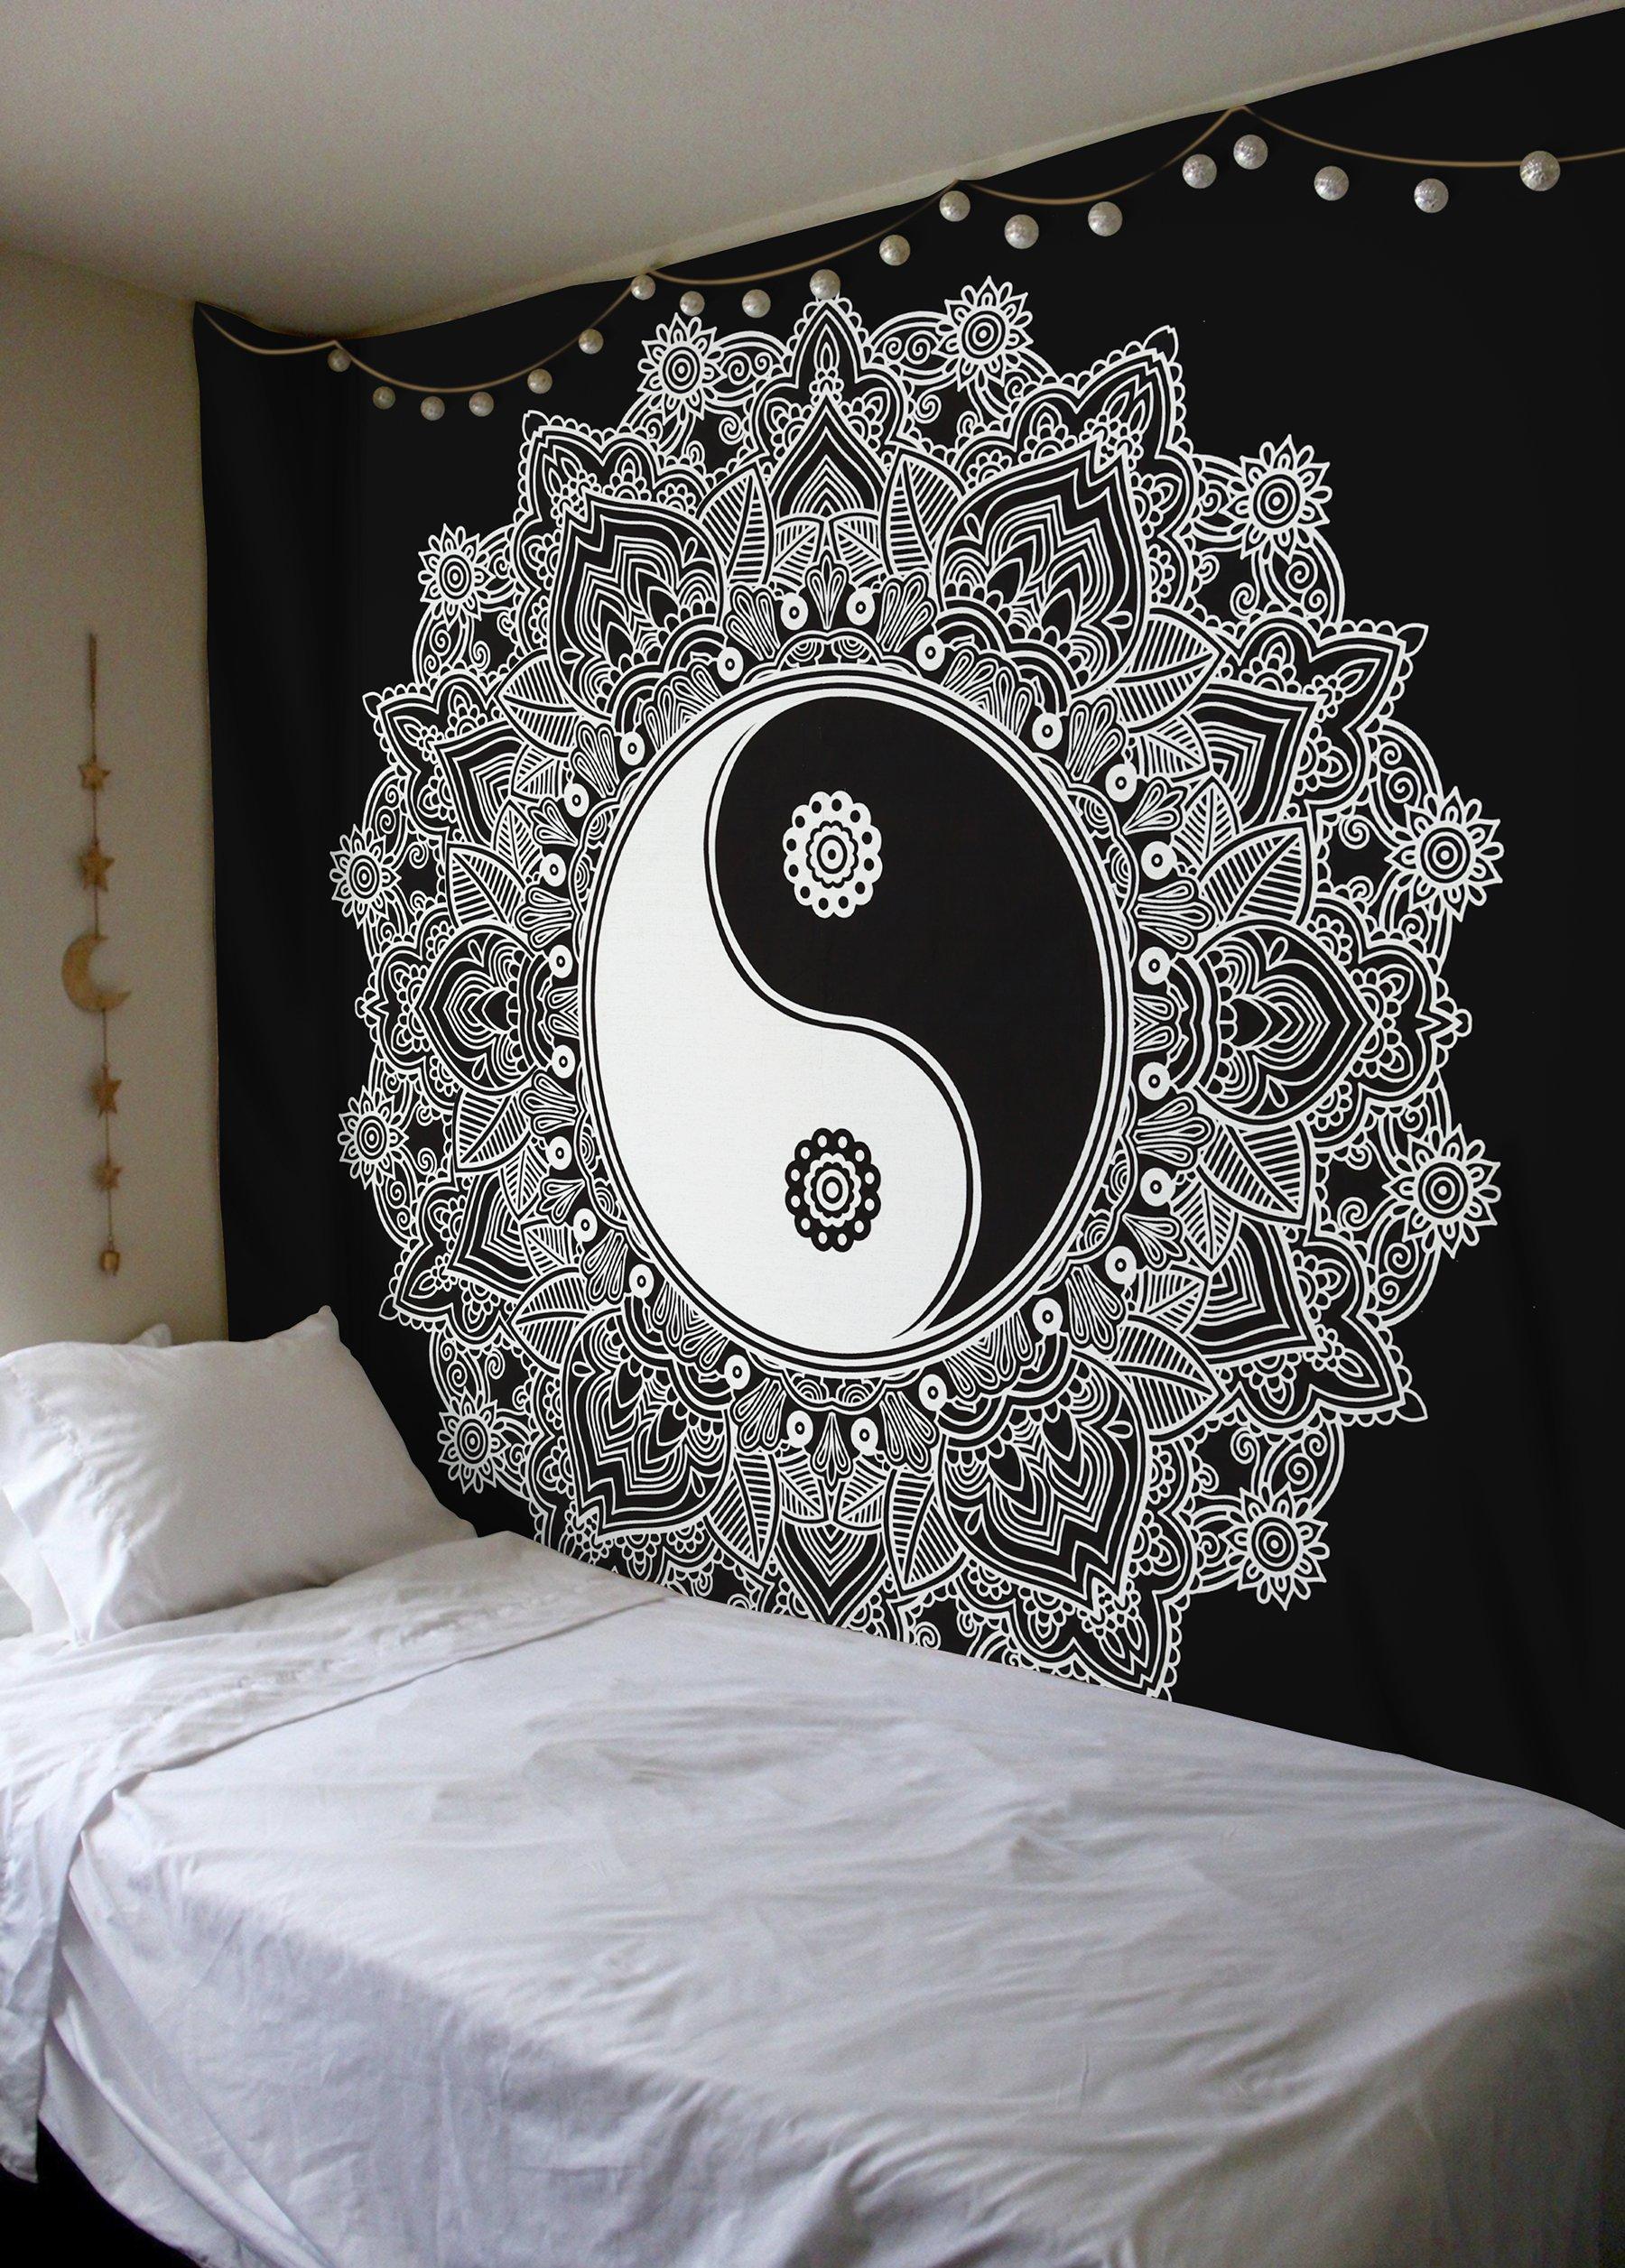 SheetKart Yinyang Wall Hanging Tapestry, Black and White Tapestry, Mandala Tapestries, Indian Traditional